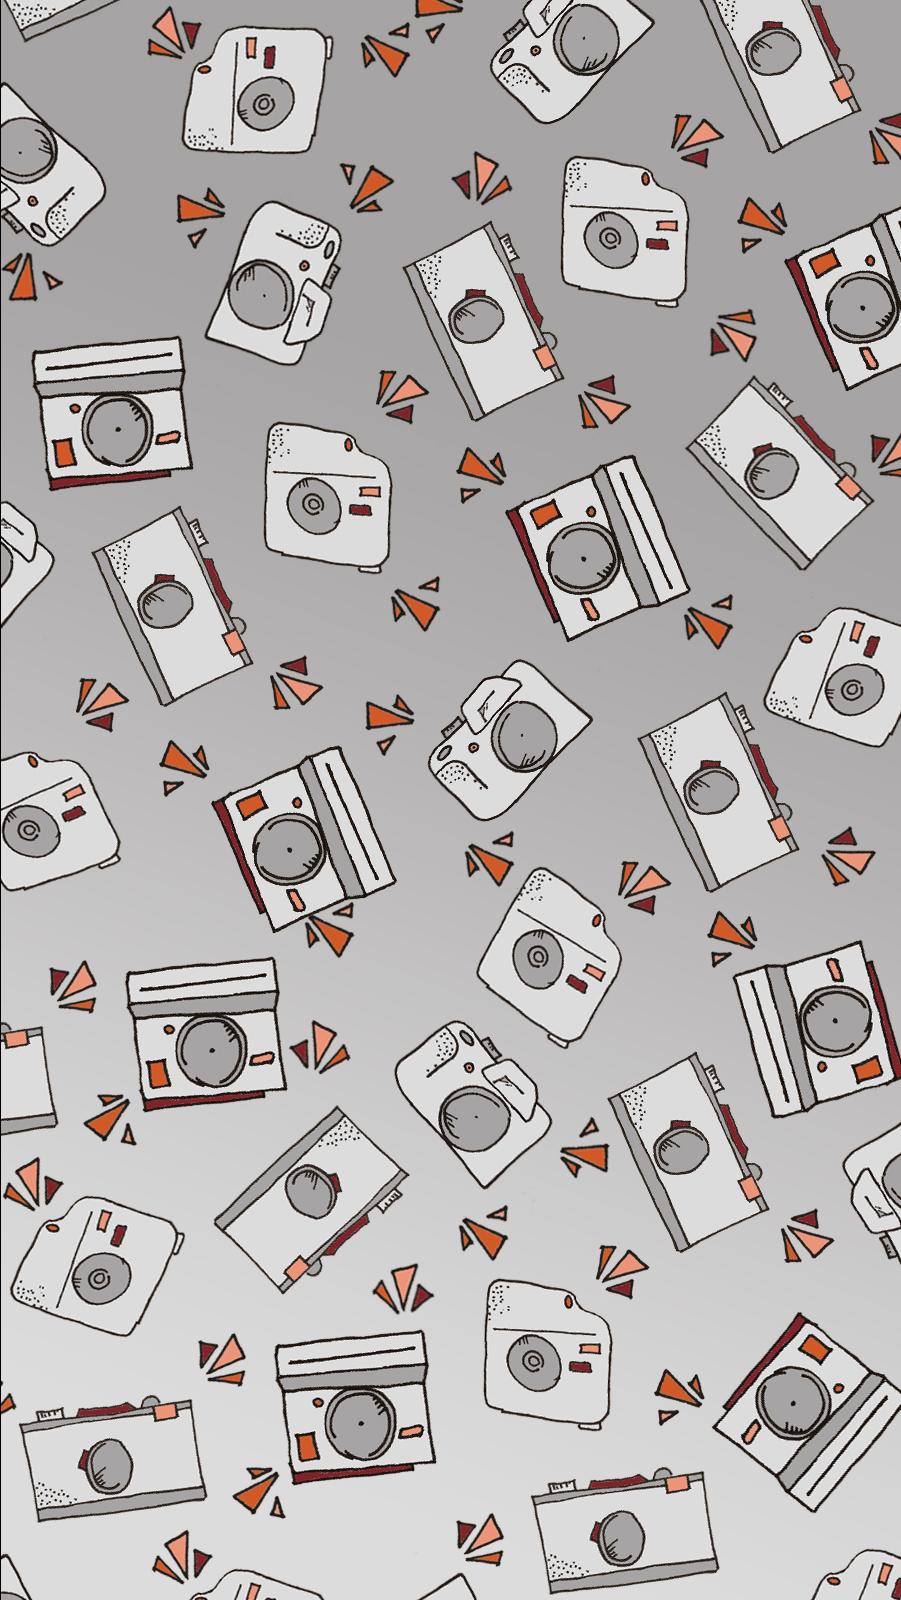 Camera Themed Wallpaper for Desktop Backgrounds or Lock Screens